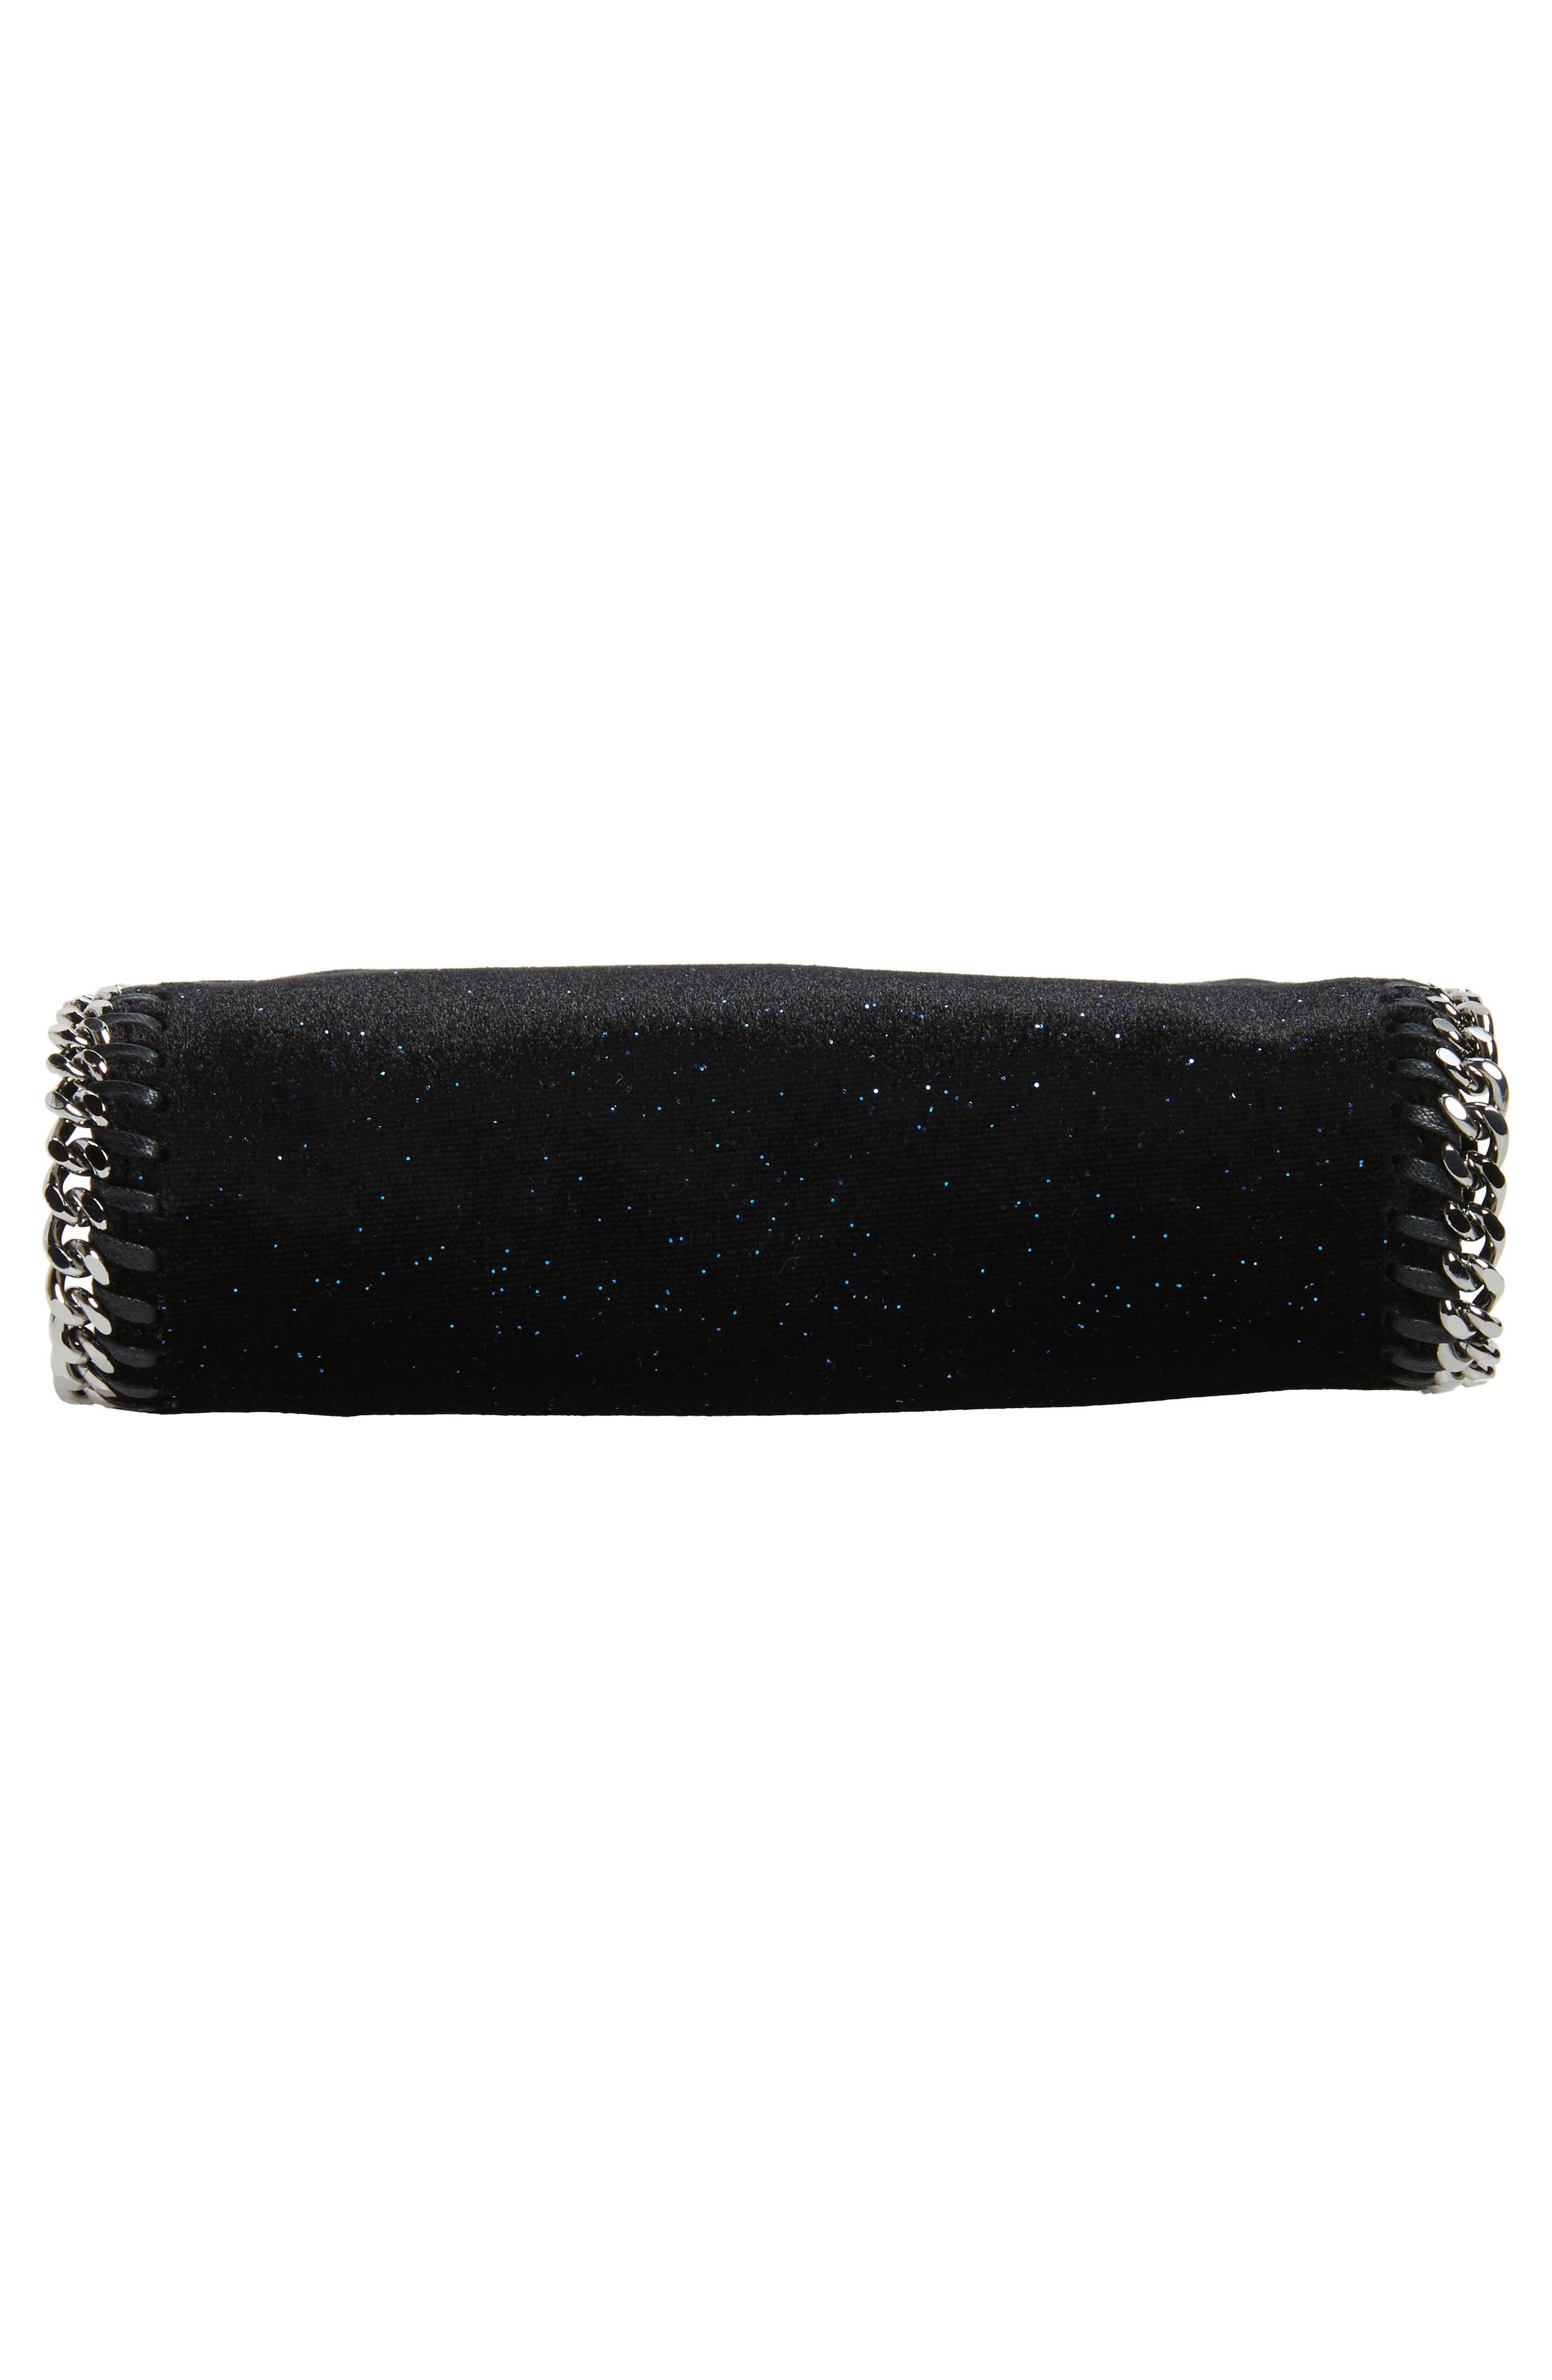 Tiny Falabella Glitter Crossbody Bag,                             Alternate thumbnail 5, color,                             Black/ Navy